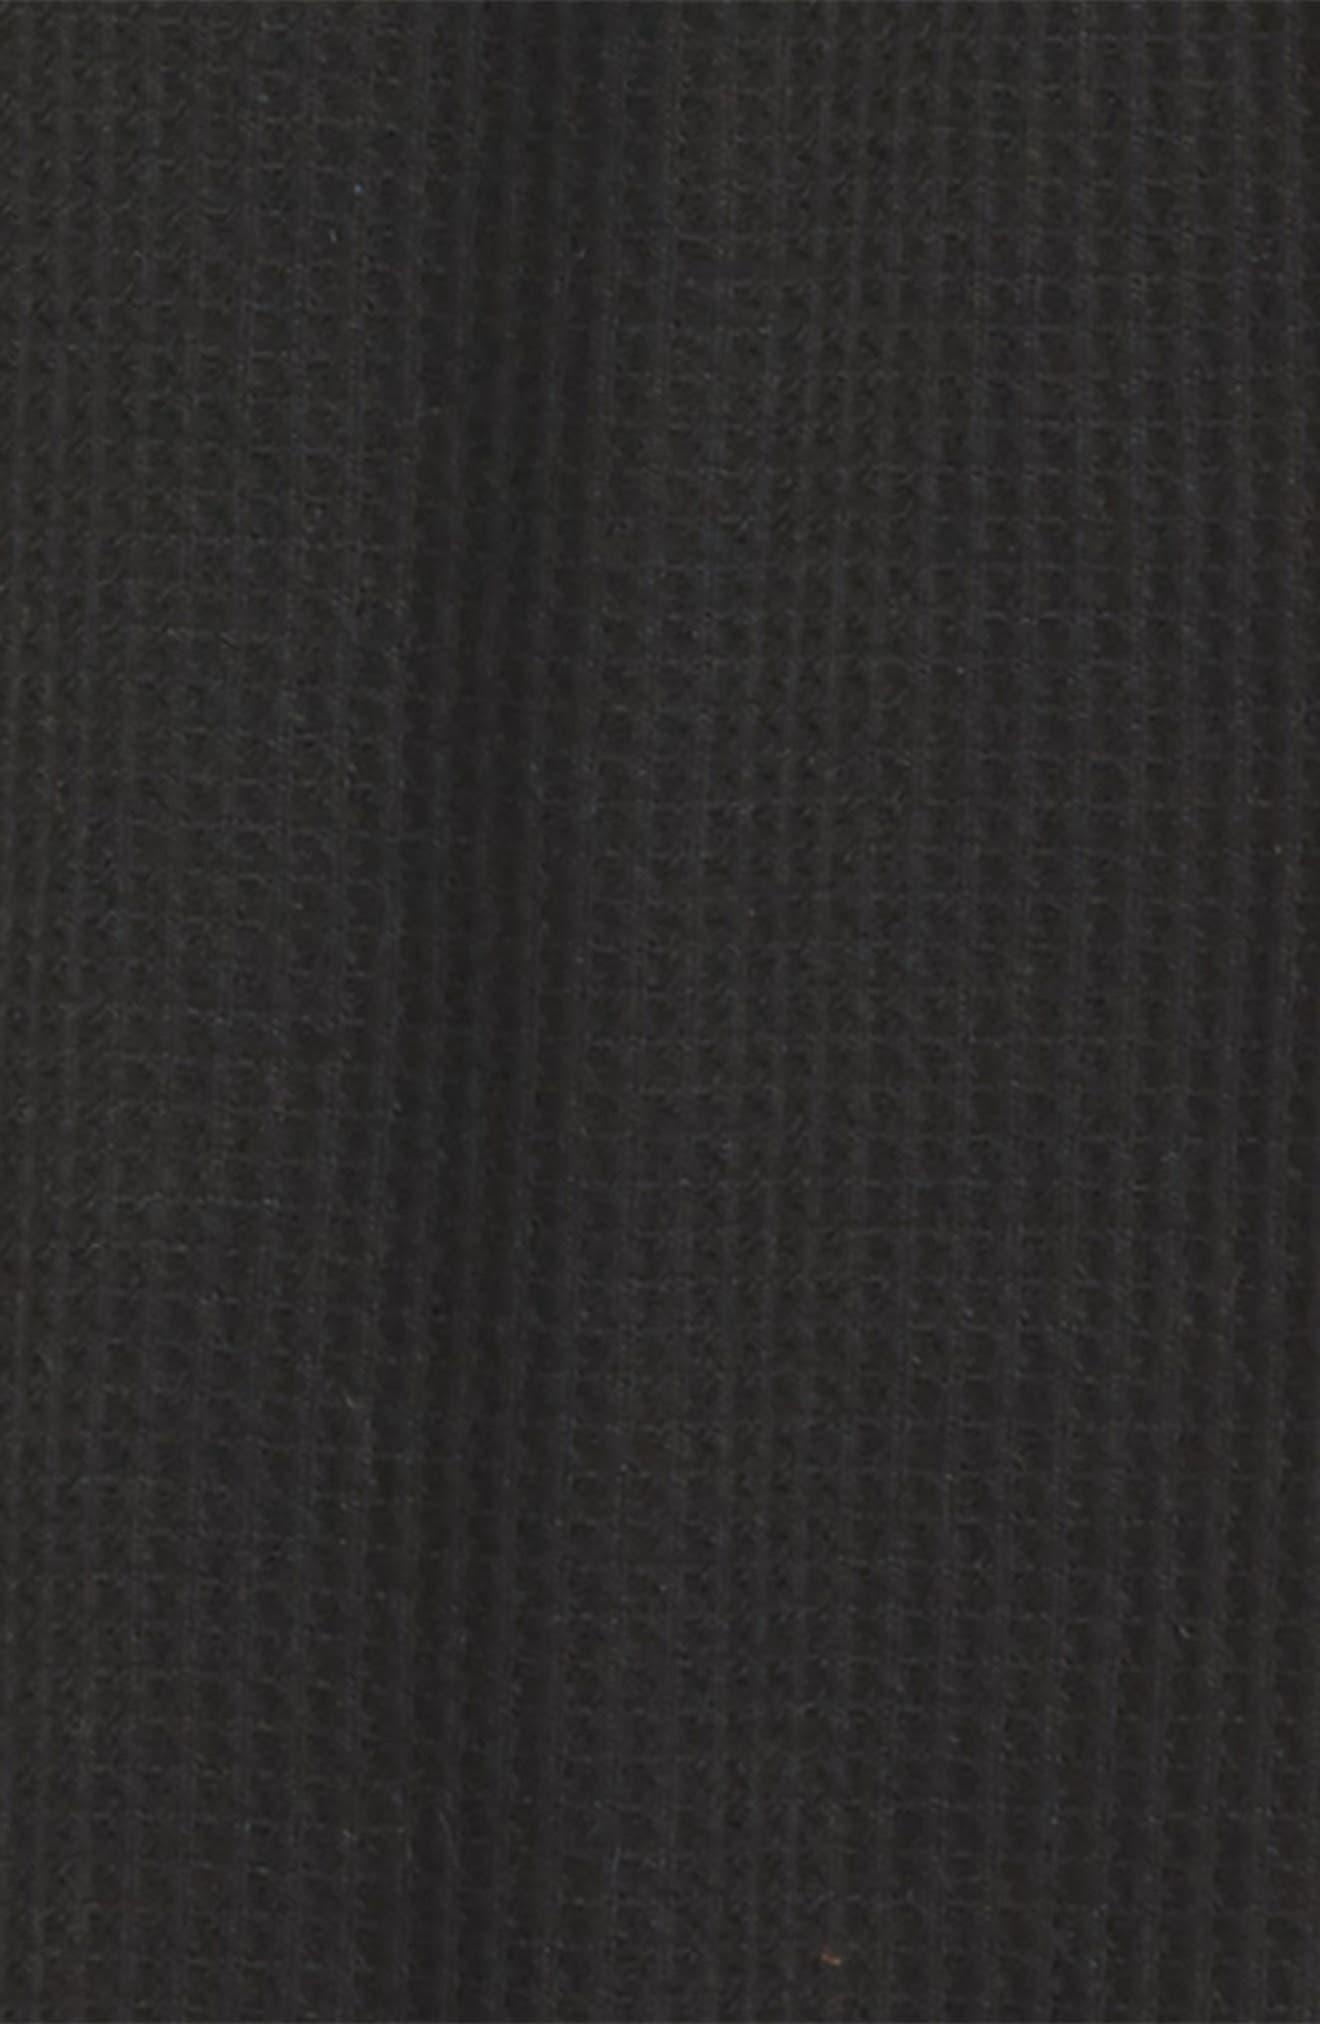 Jude Thermal Knit Jogger Pants,                             Alternate thumbnail 2, color,                             001